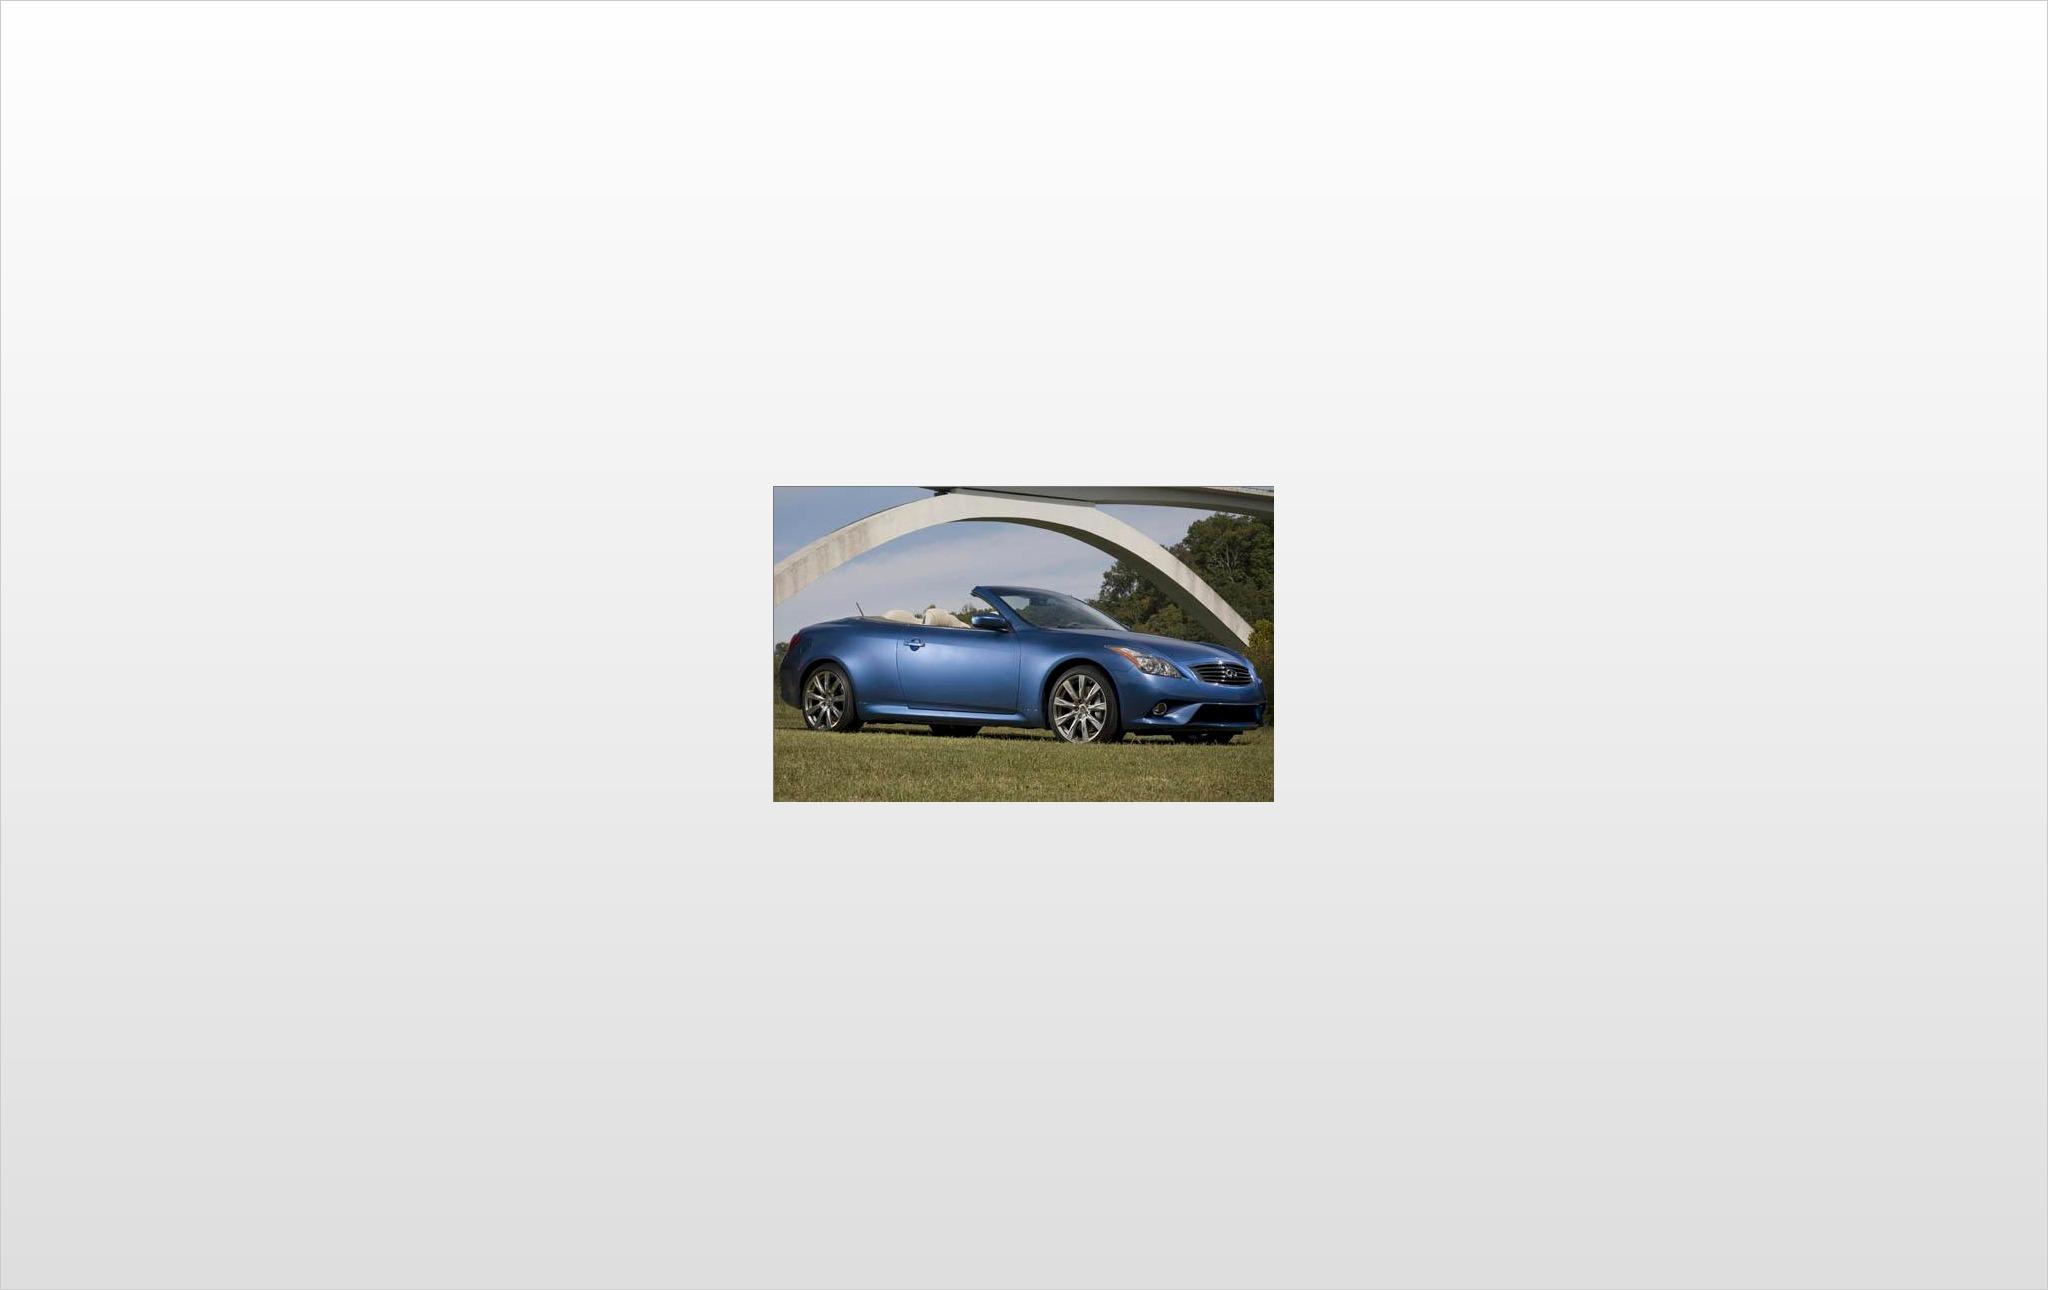 2011 infiniti g convertible convertible g37 sport fq oem 1 2048